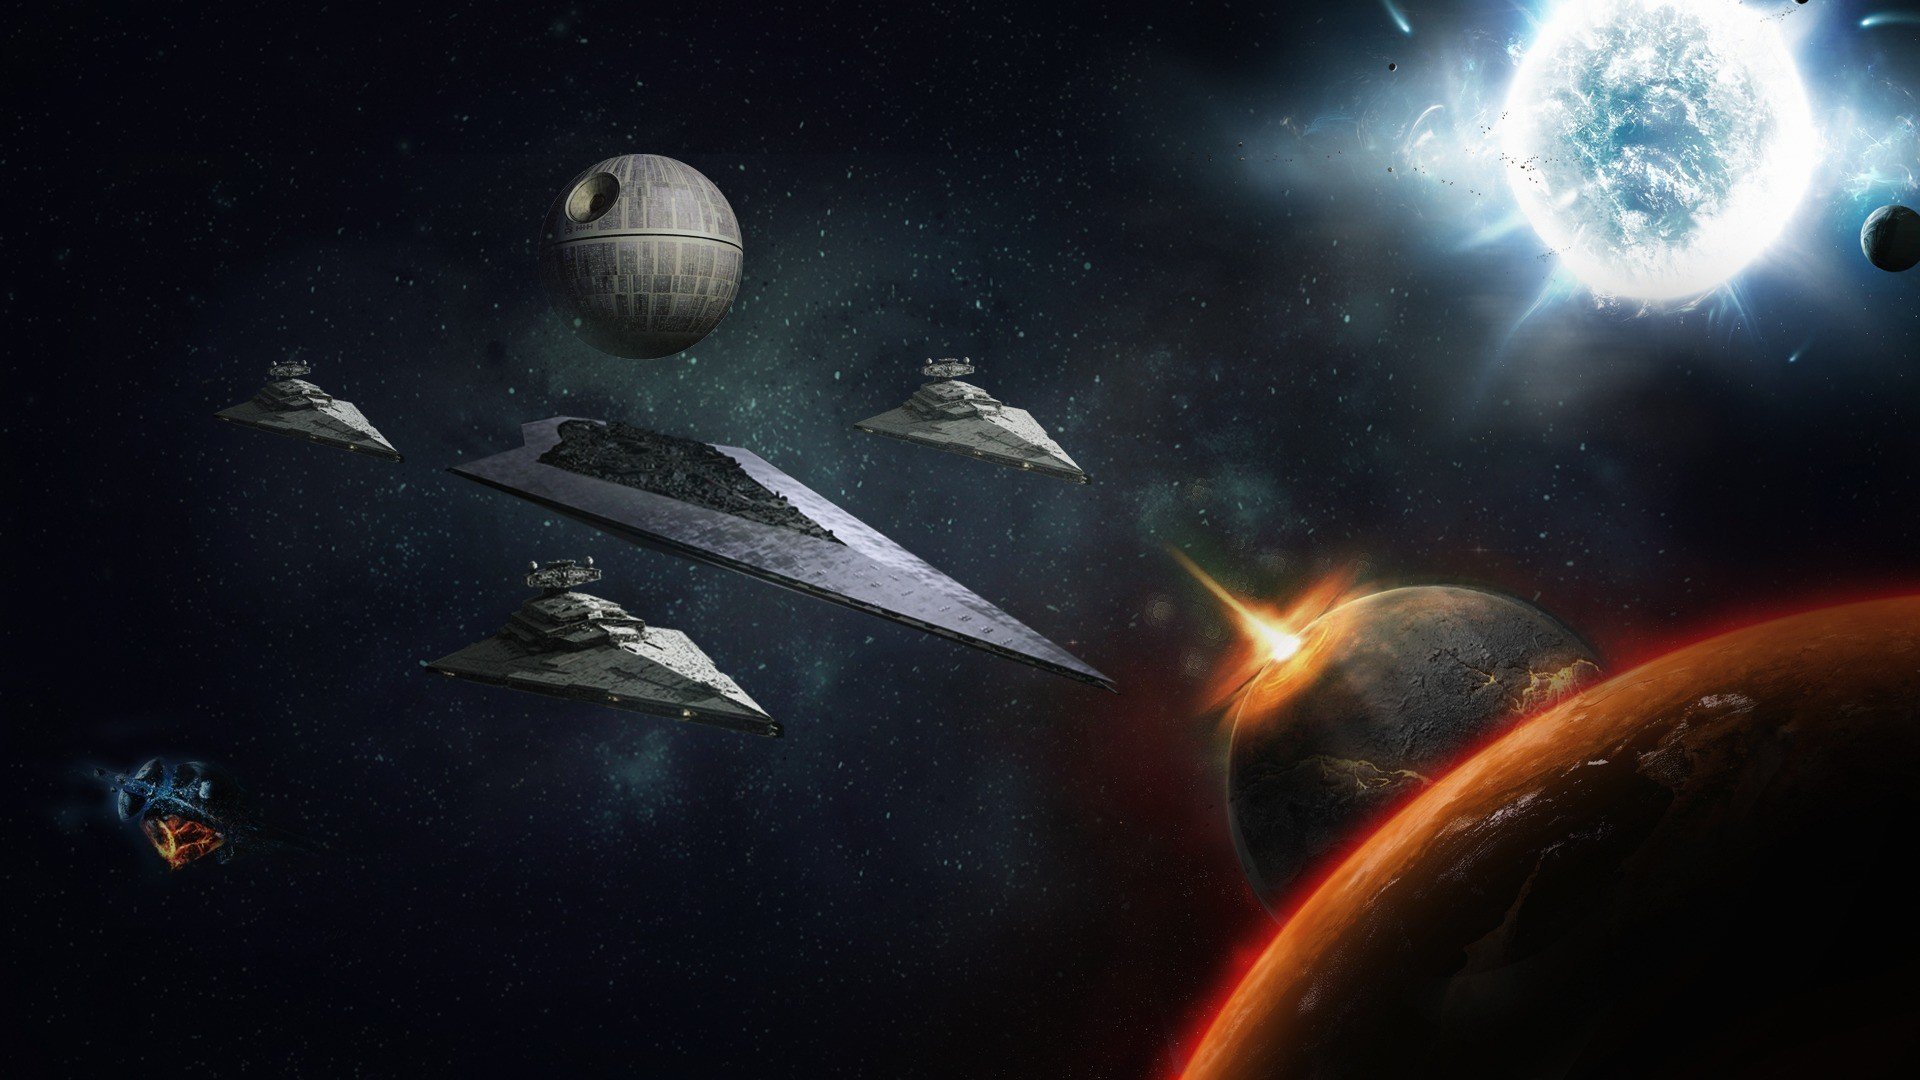 Star Wars, death star, fantasy, game, planet, space, starship,